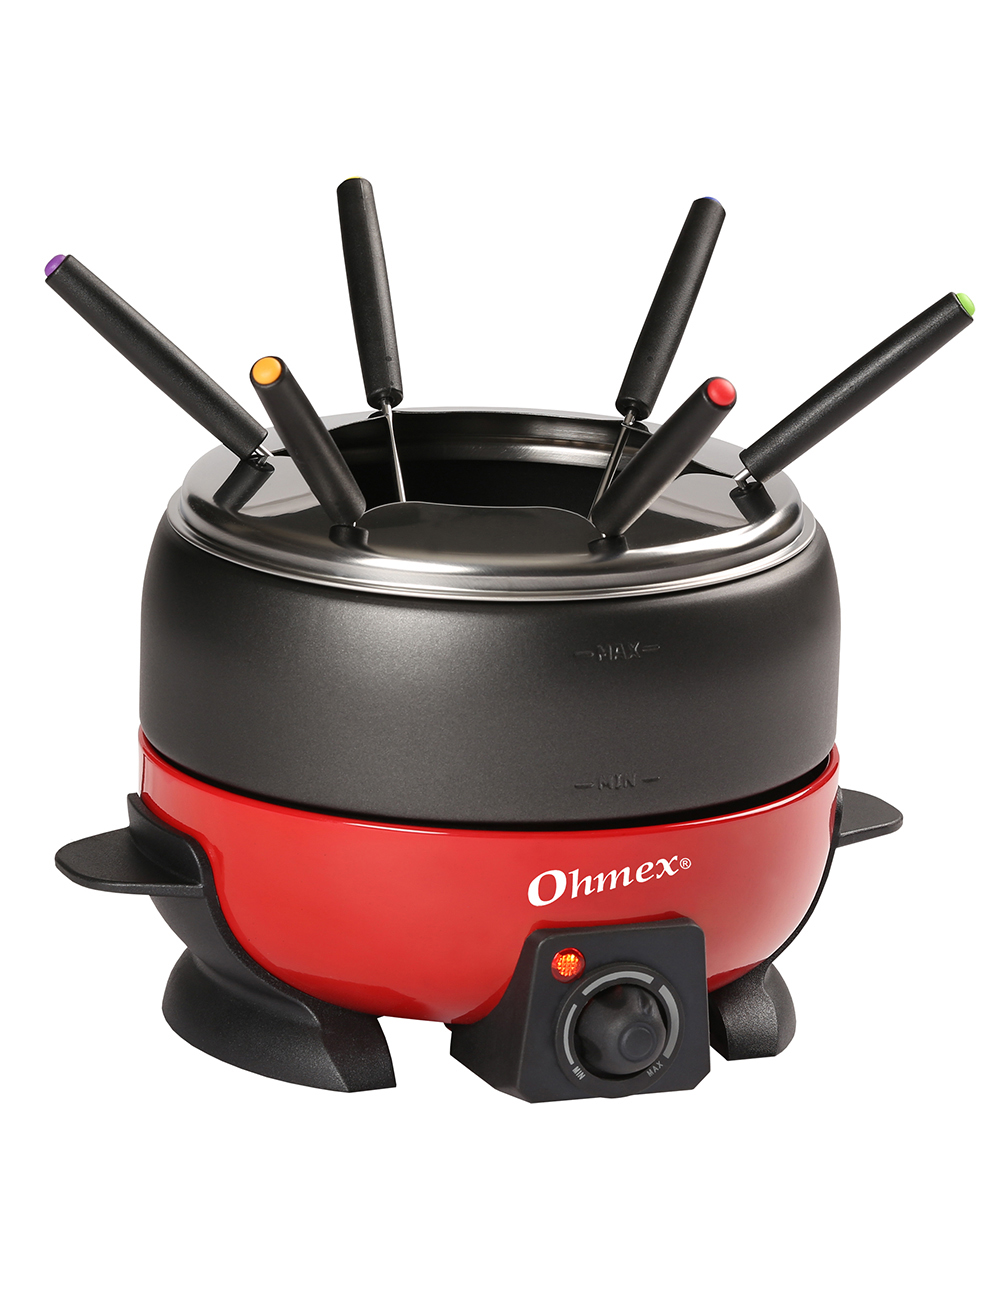 fondue set ohmex mit 6 fondue gabeln. Black Bedroom Furniture Sets. Home Design Ideas